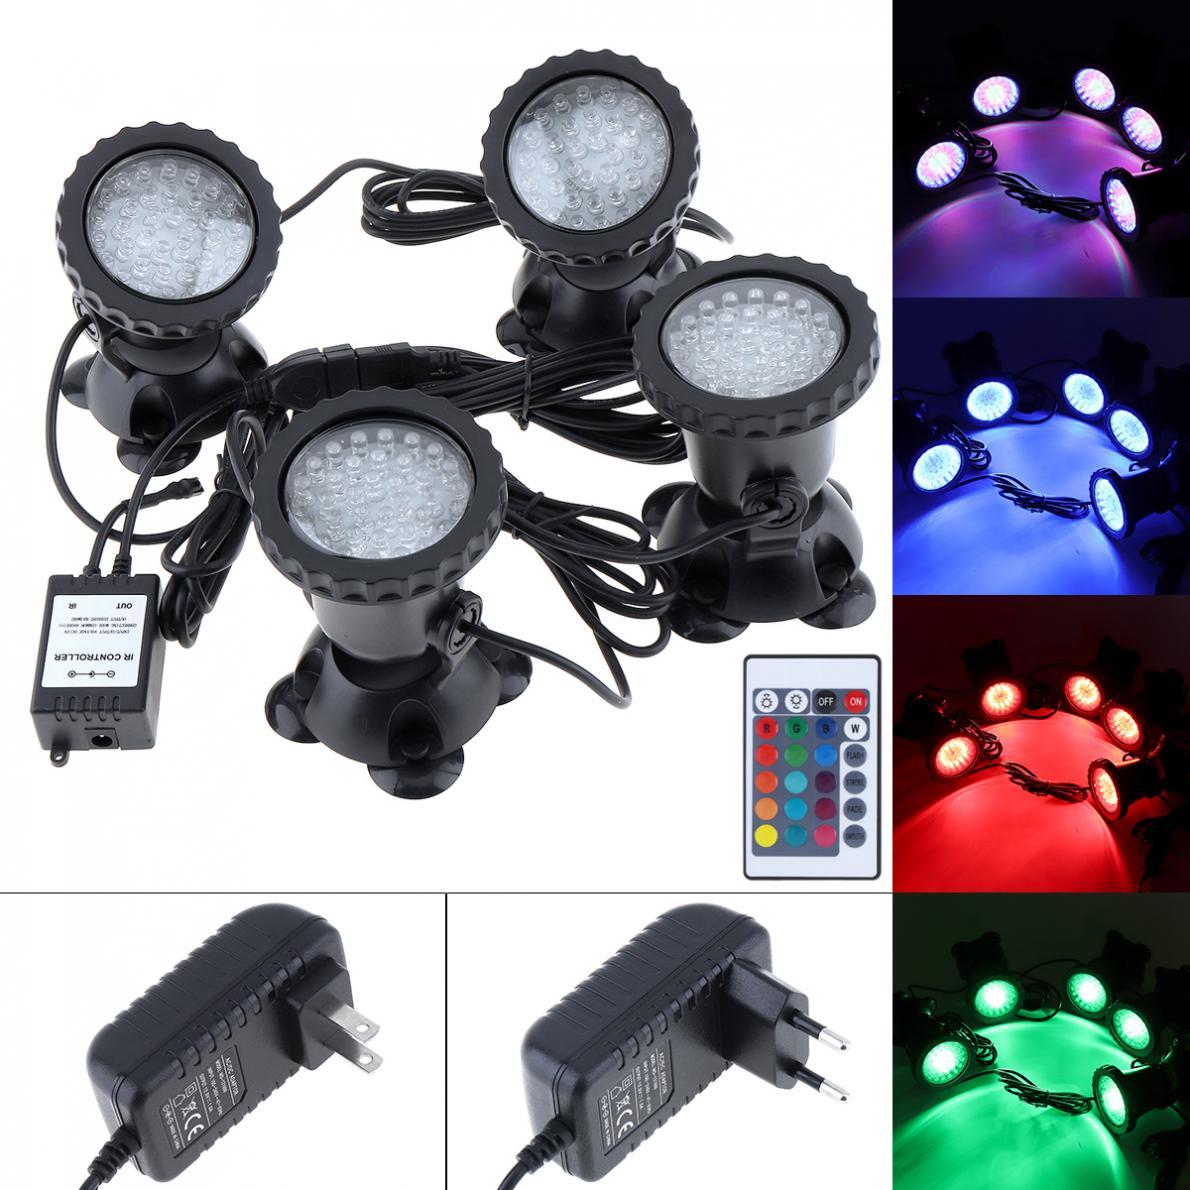 Impermeable 4 luces 36 LEDs Color paisajismo focos agua hierba Control remoto 16 colores para acuario piscina tanque de peces